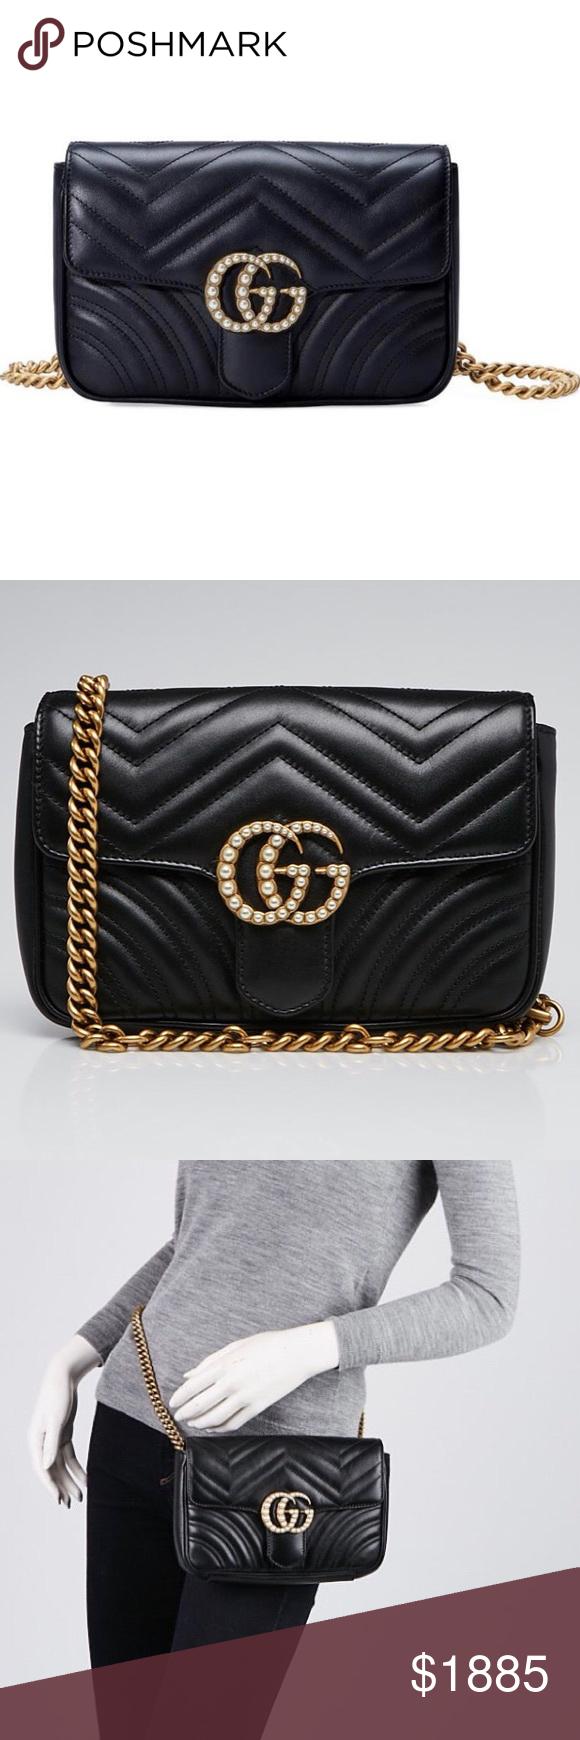 ce81cebf4db Gucci Marmont Matelasse Pearl GG Flap Belt Bag GENTLY USED Gucci Marmont  Matelasse Flap Belt Bag